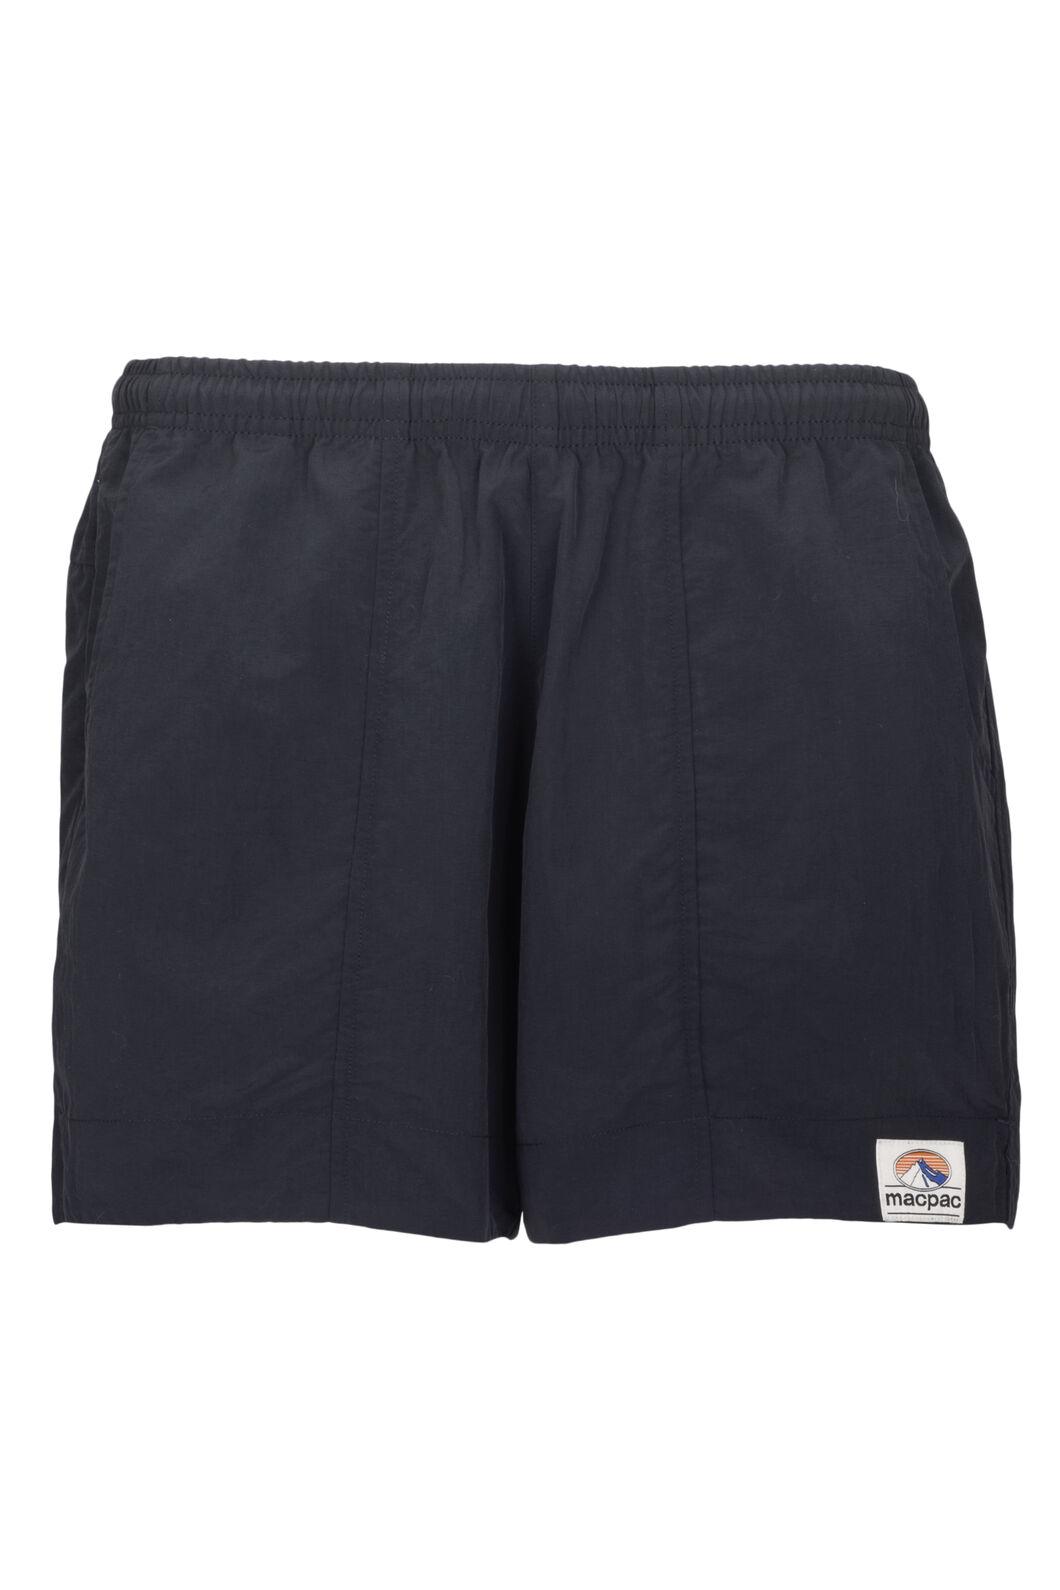 Macpac Winger Shorts — Women's, Black, hi-res